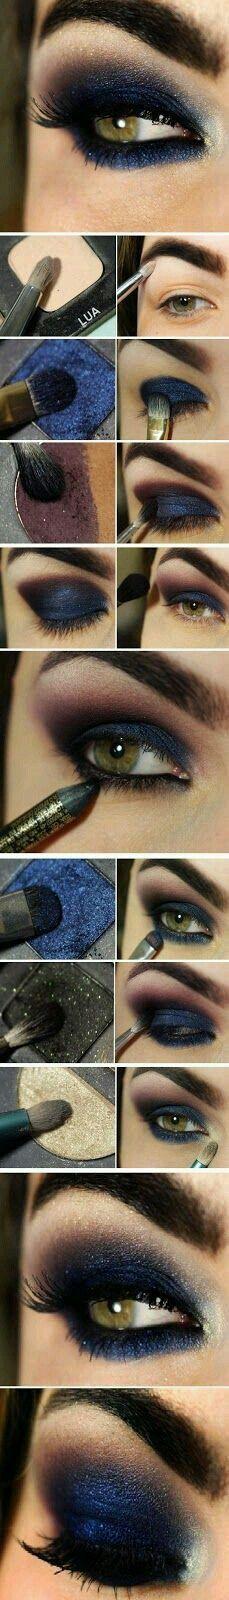 dark blue eyeshadow - wonder how that would look with blues eyes